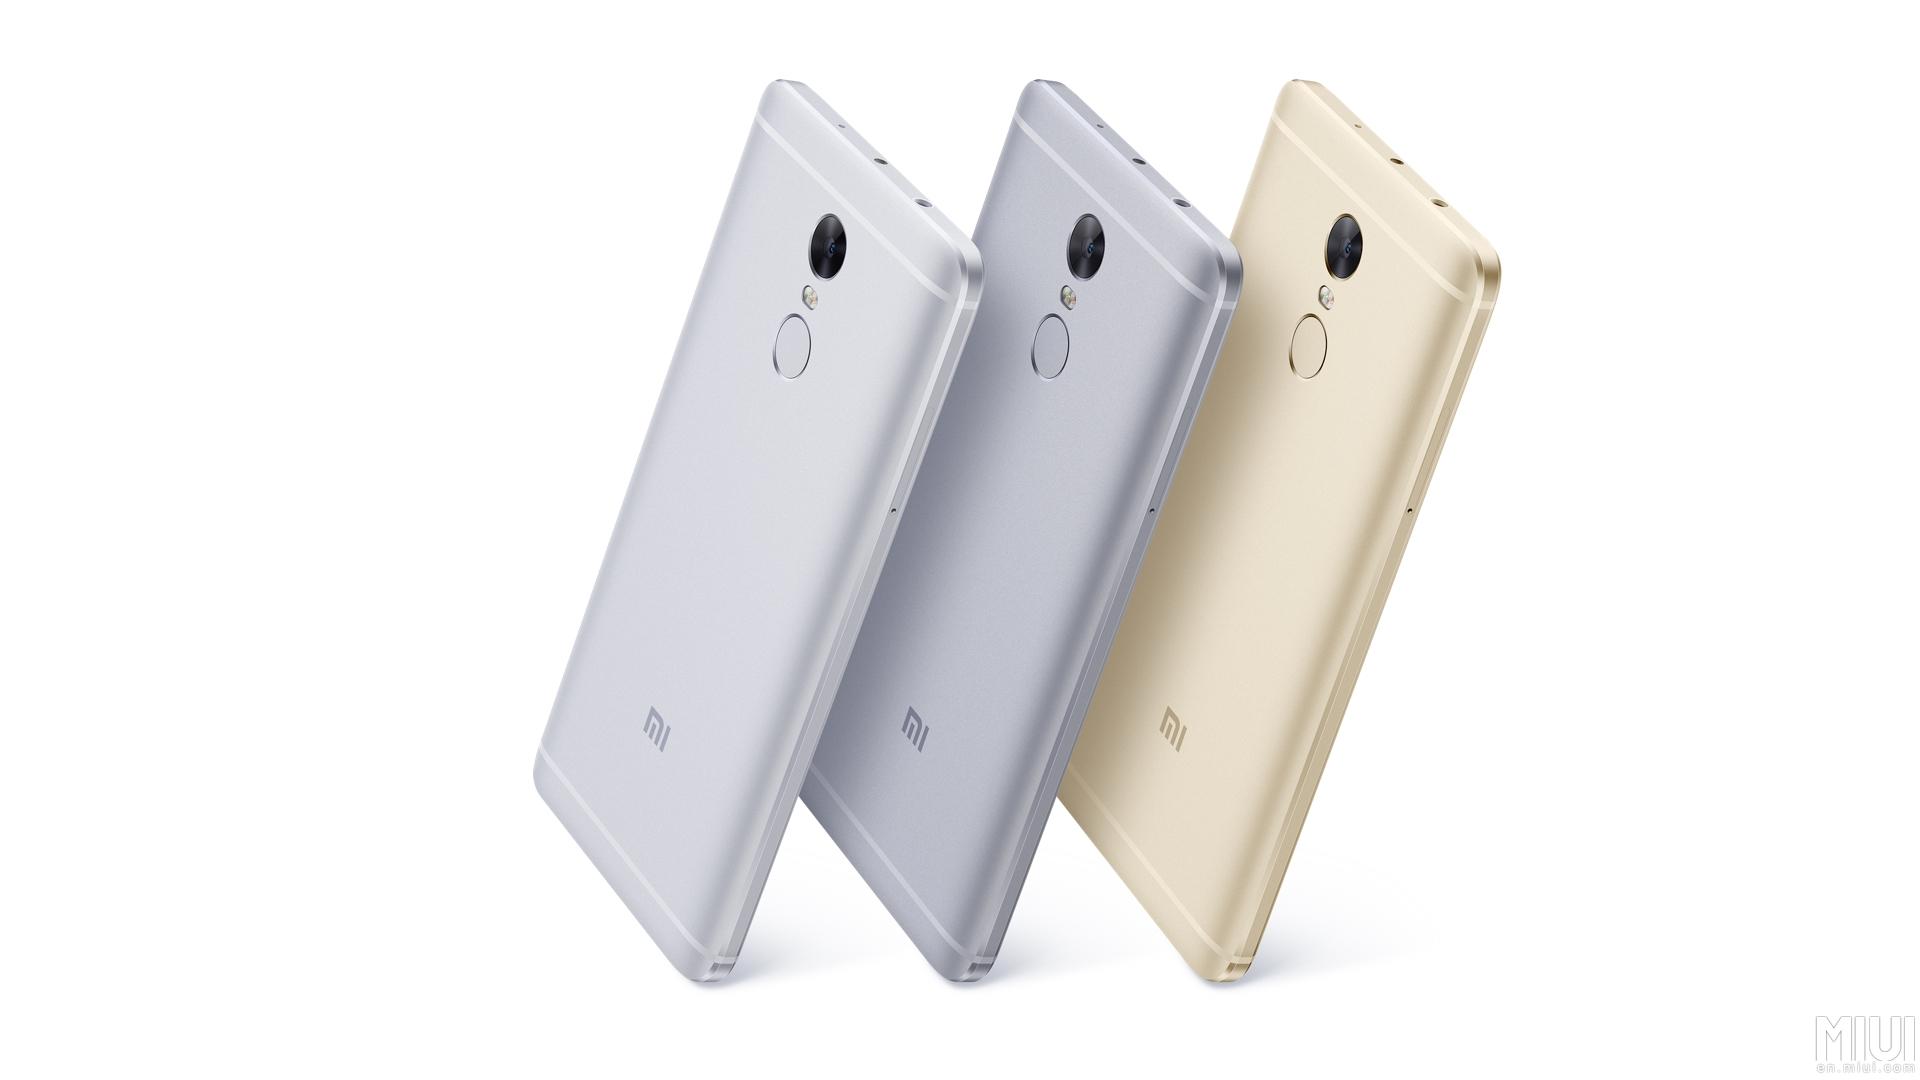 Xiaomi envisagerait d'exporter sa gamme Redmi à l'international